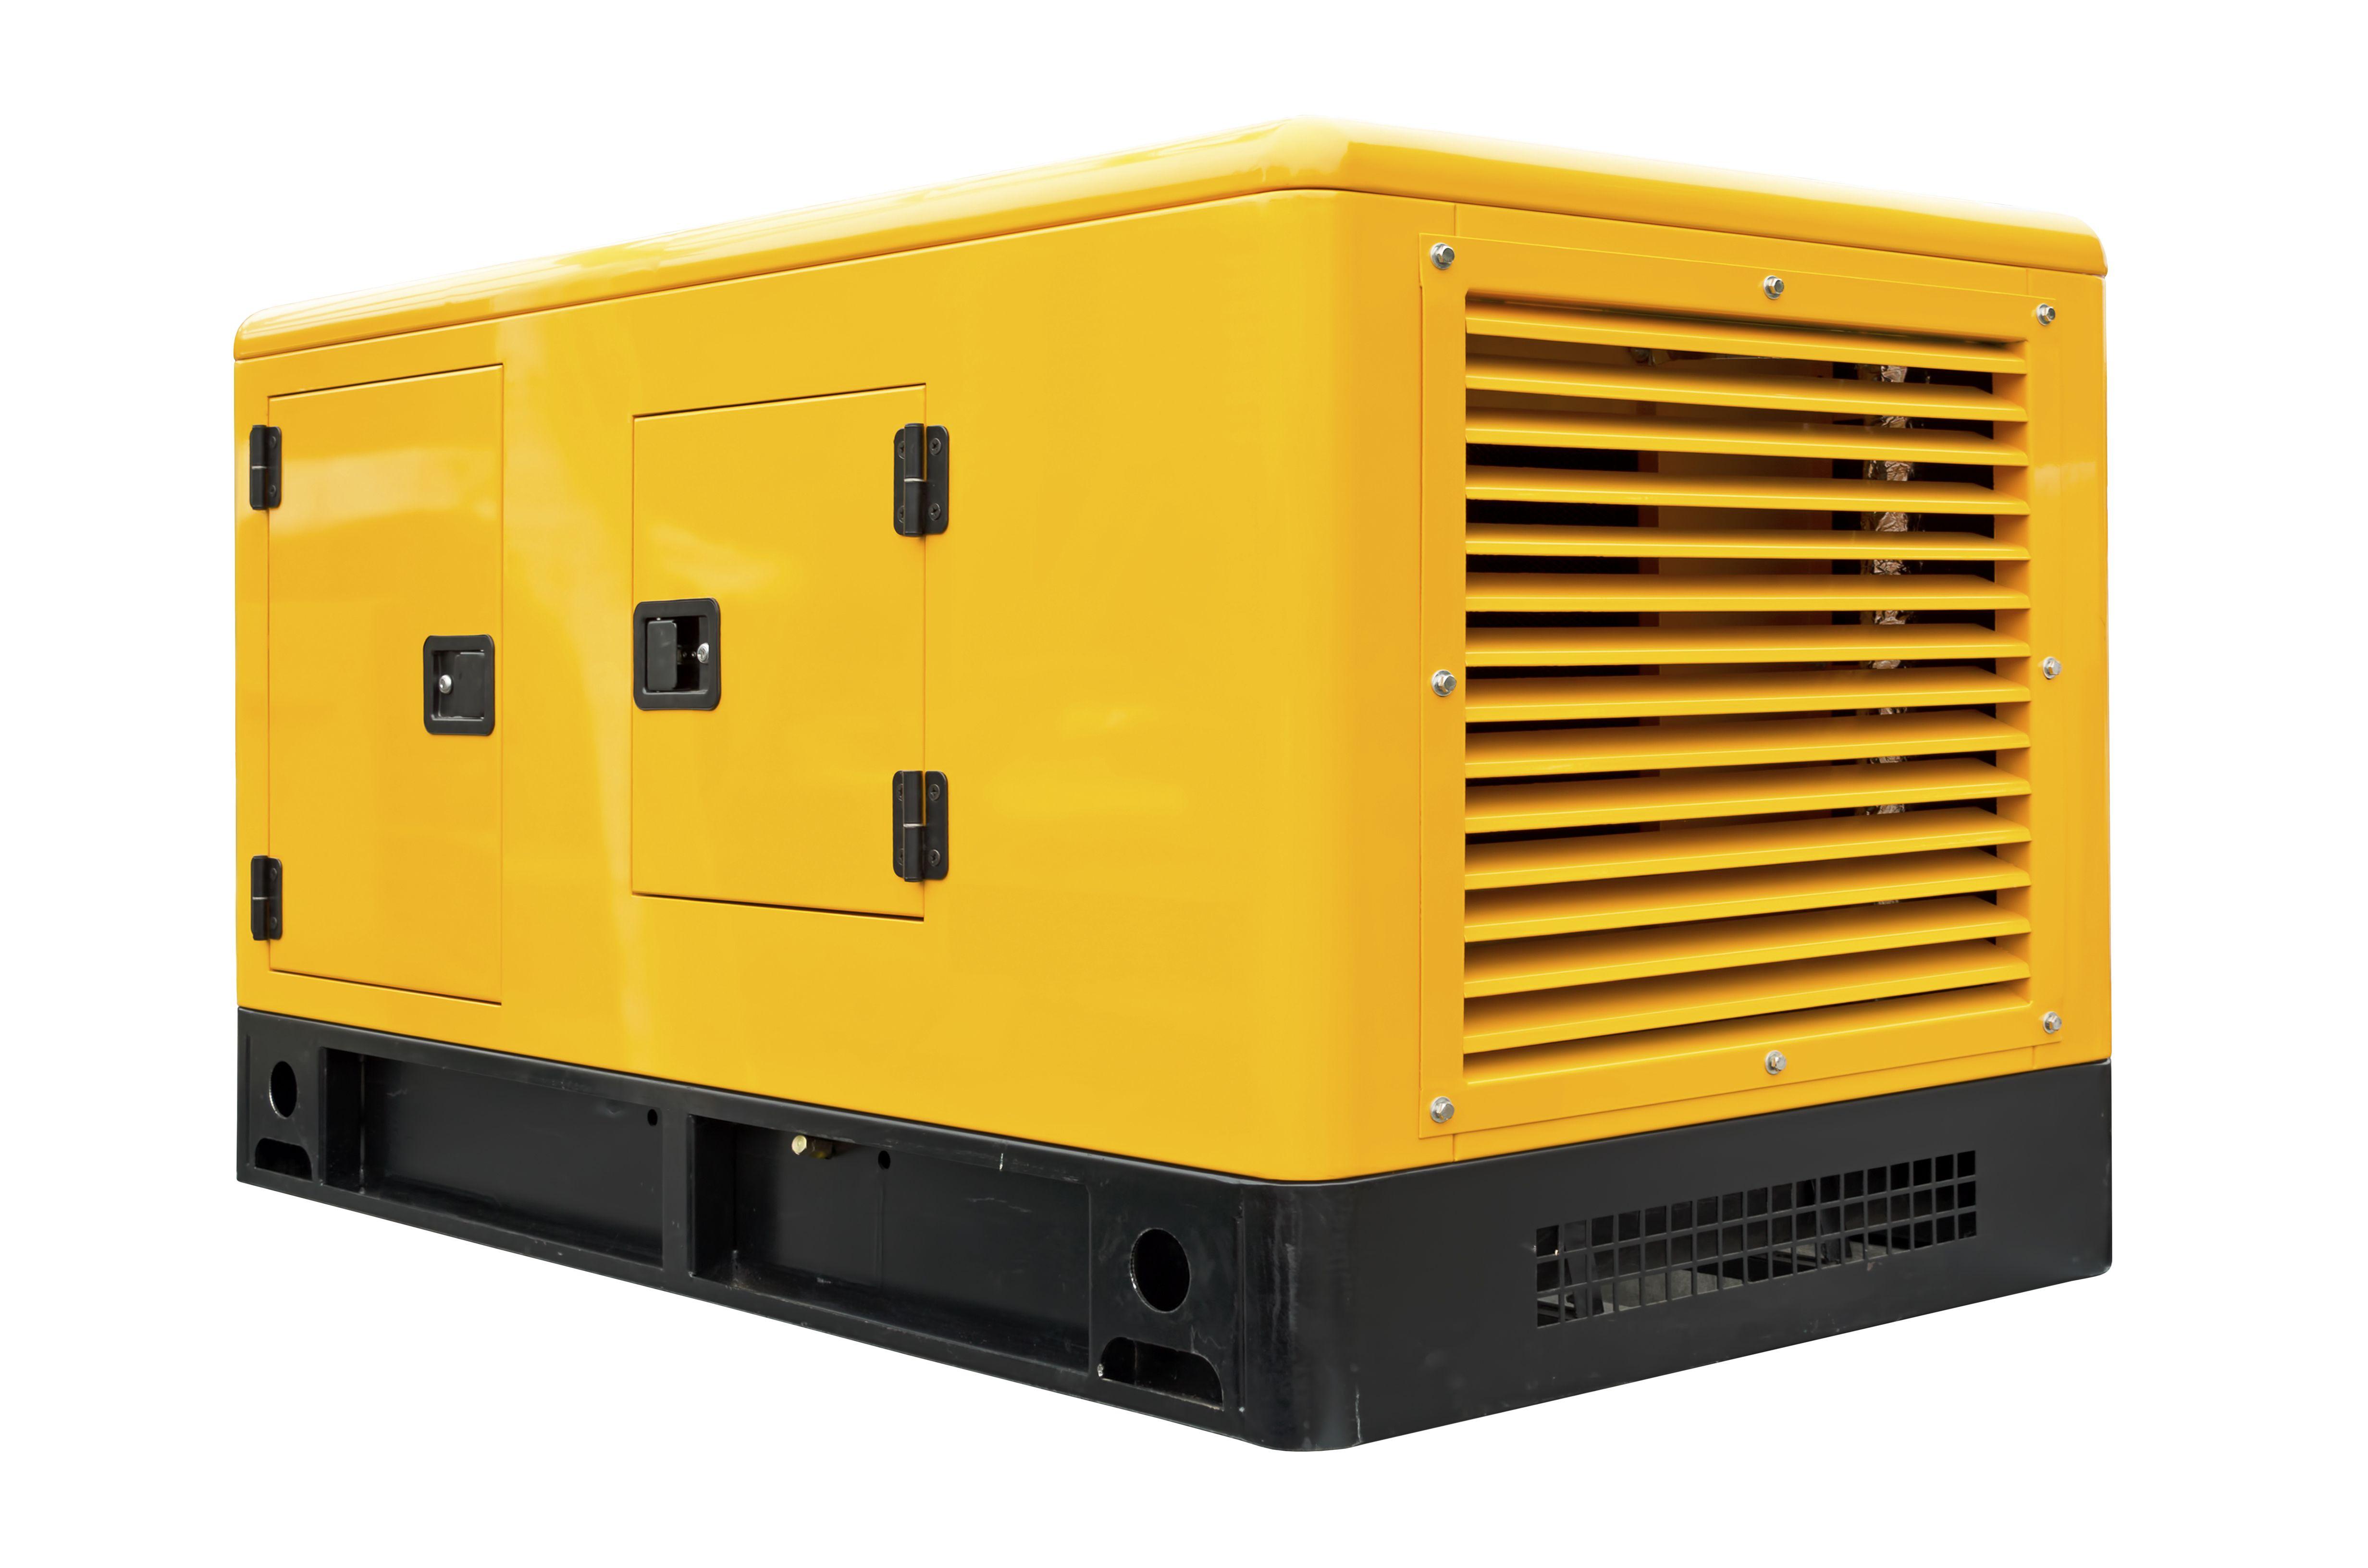 Backup Home Generator Jpg 4928 3264 Generator Installation